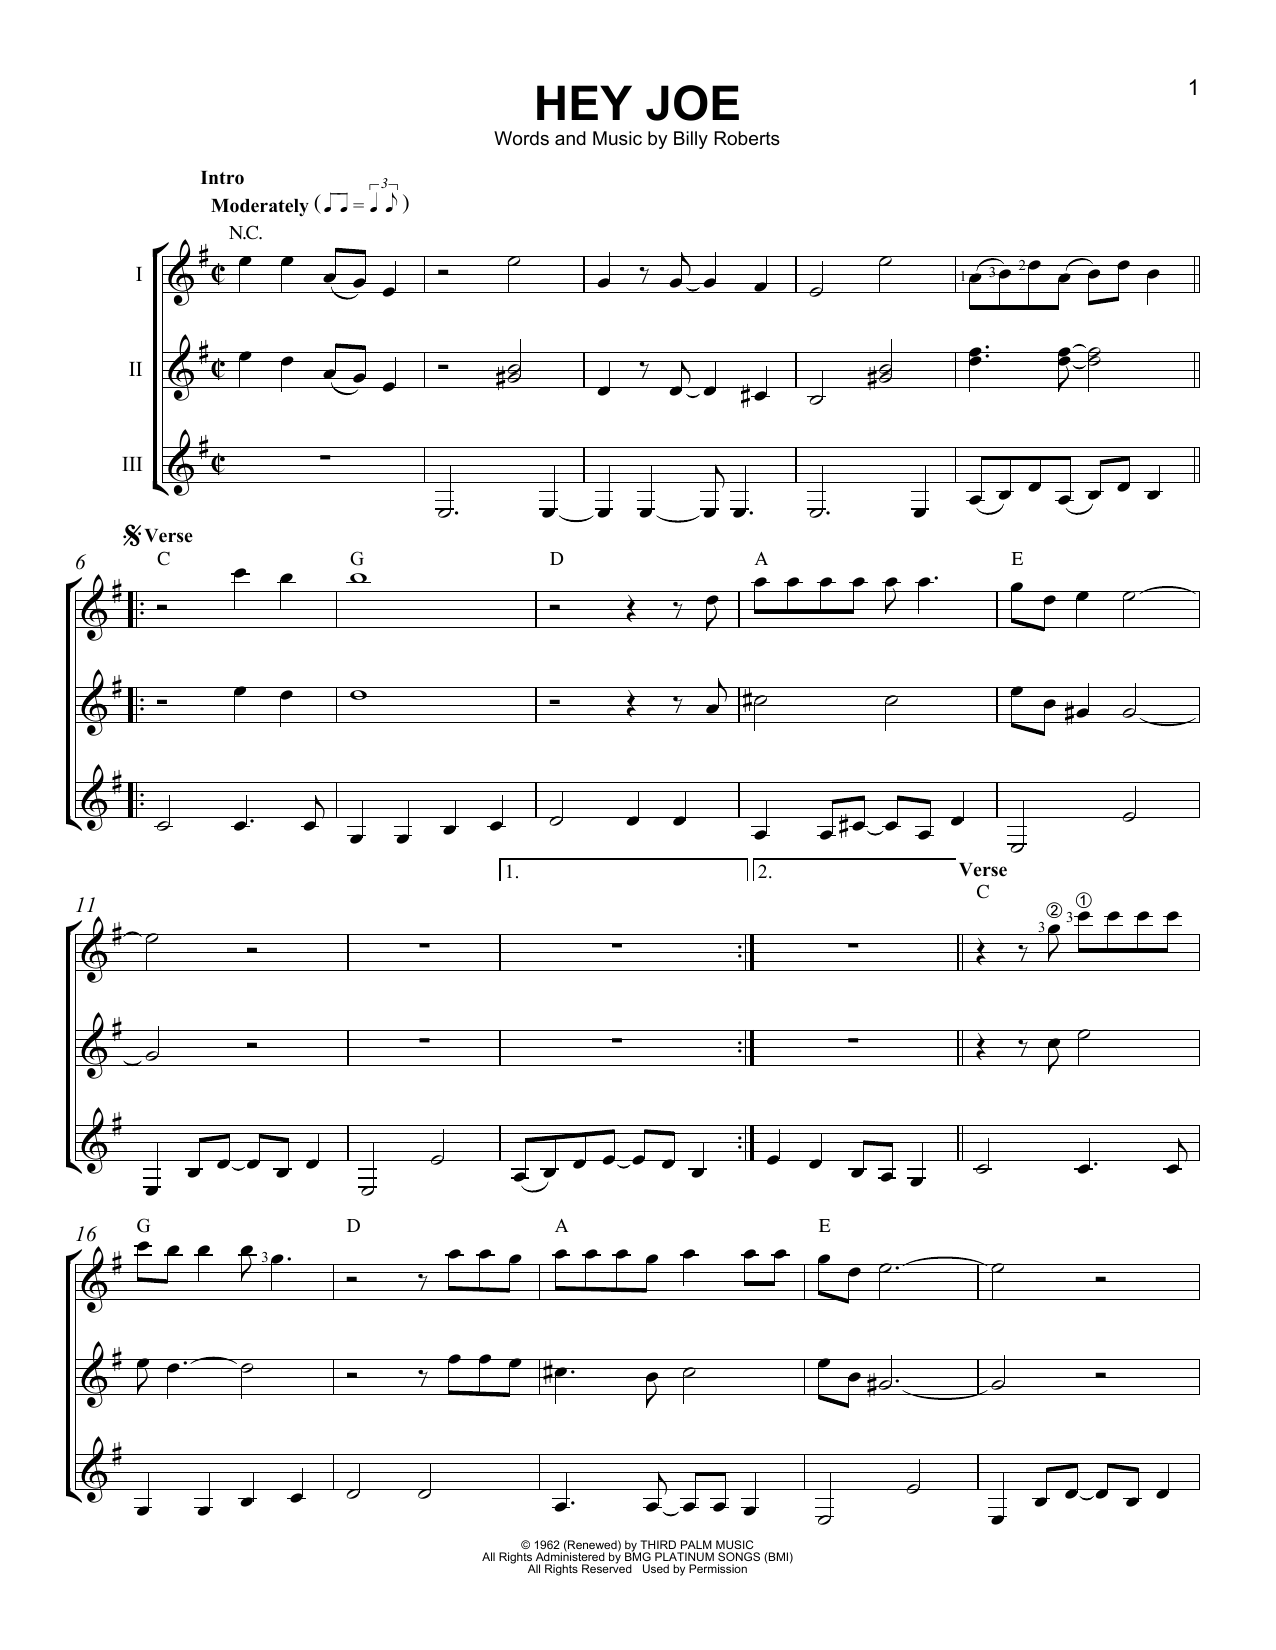 Sheet Music Digital Files To Print Licensed Billy Roberts Digital